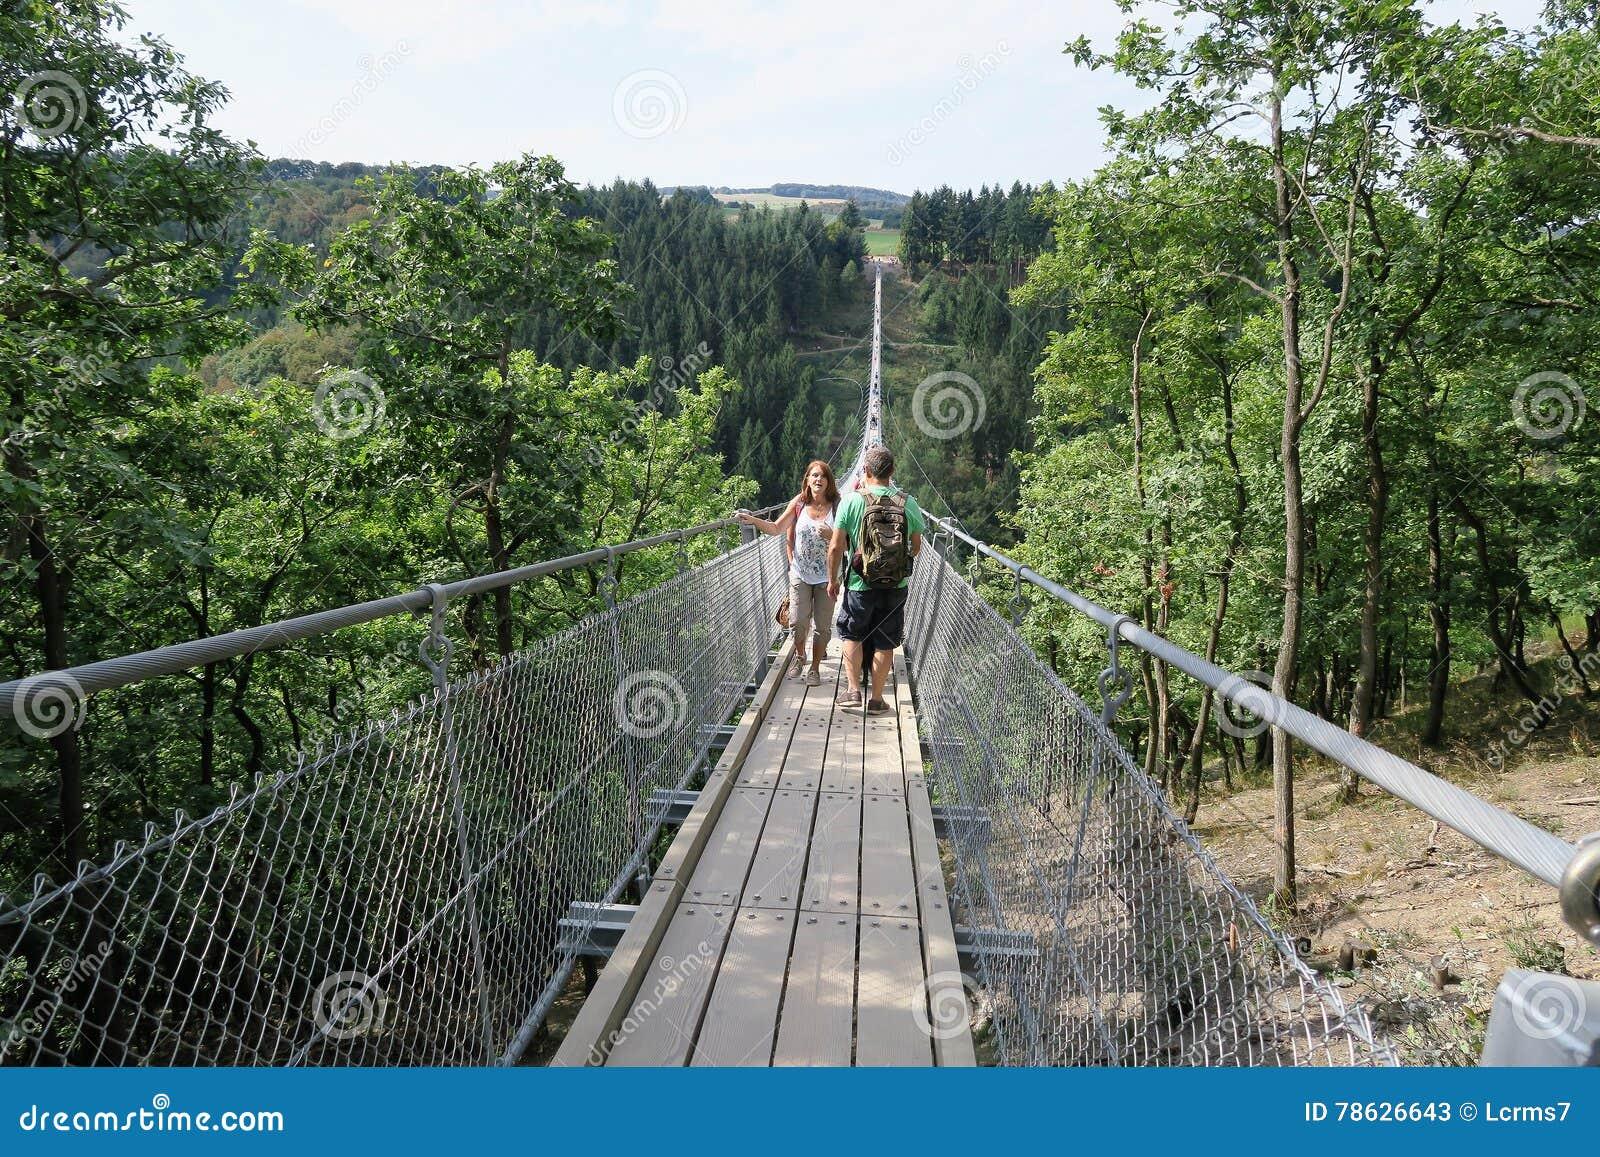 Simple suspension bridge geierlay in moersdorf at for Simple suspension hanging